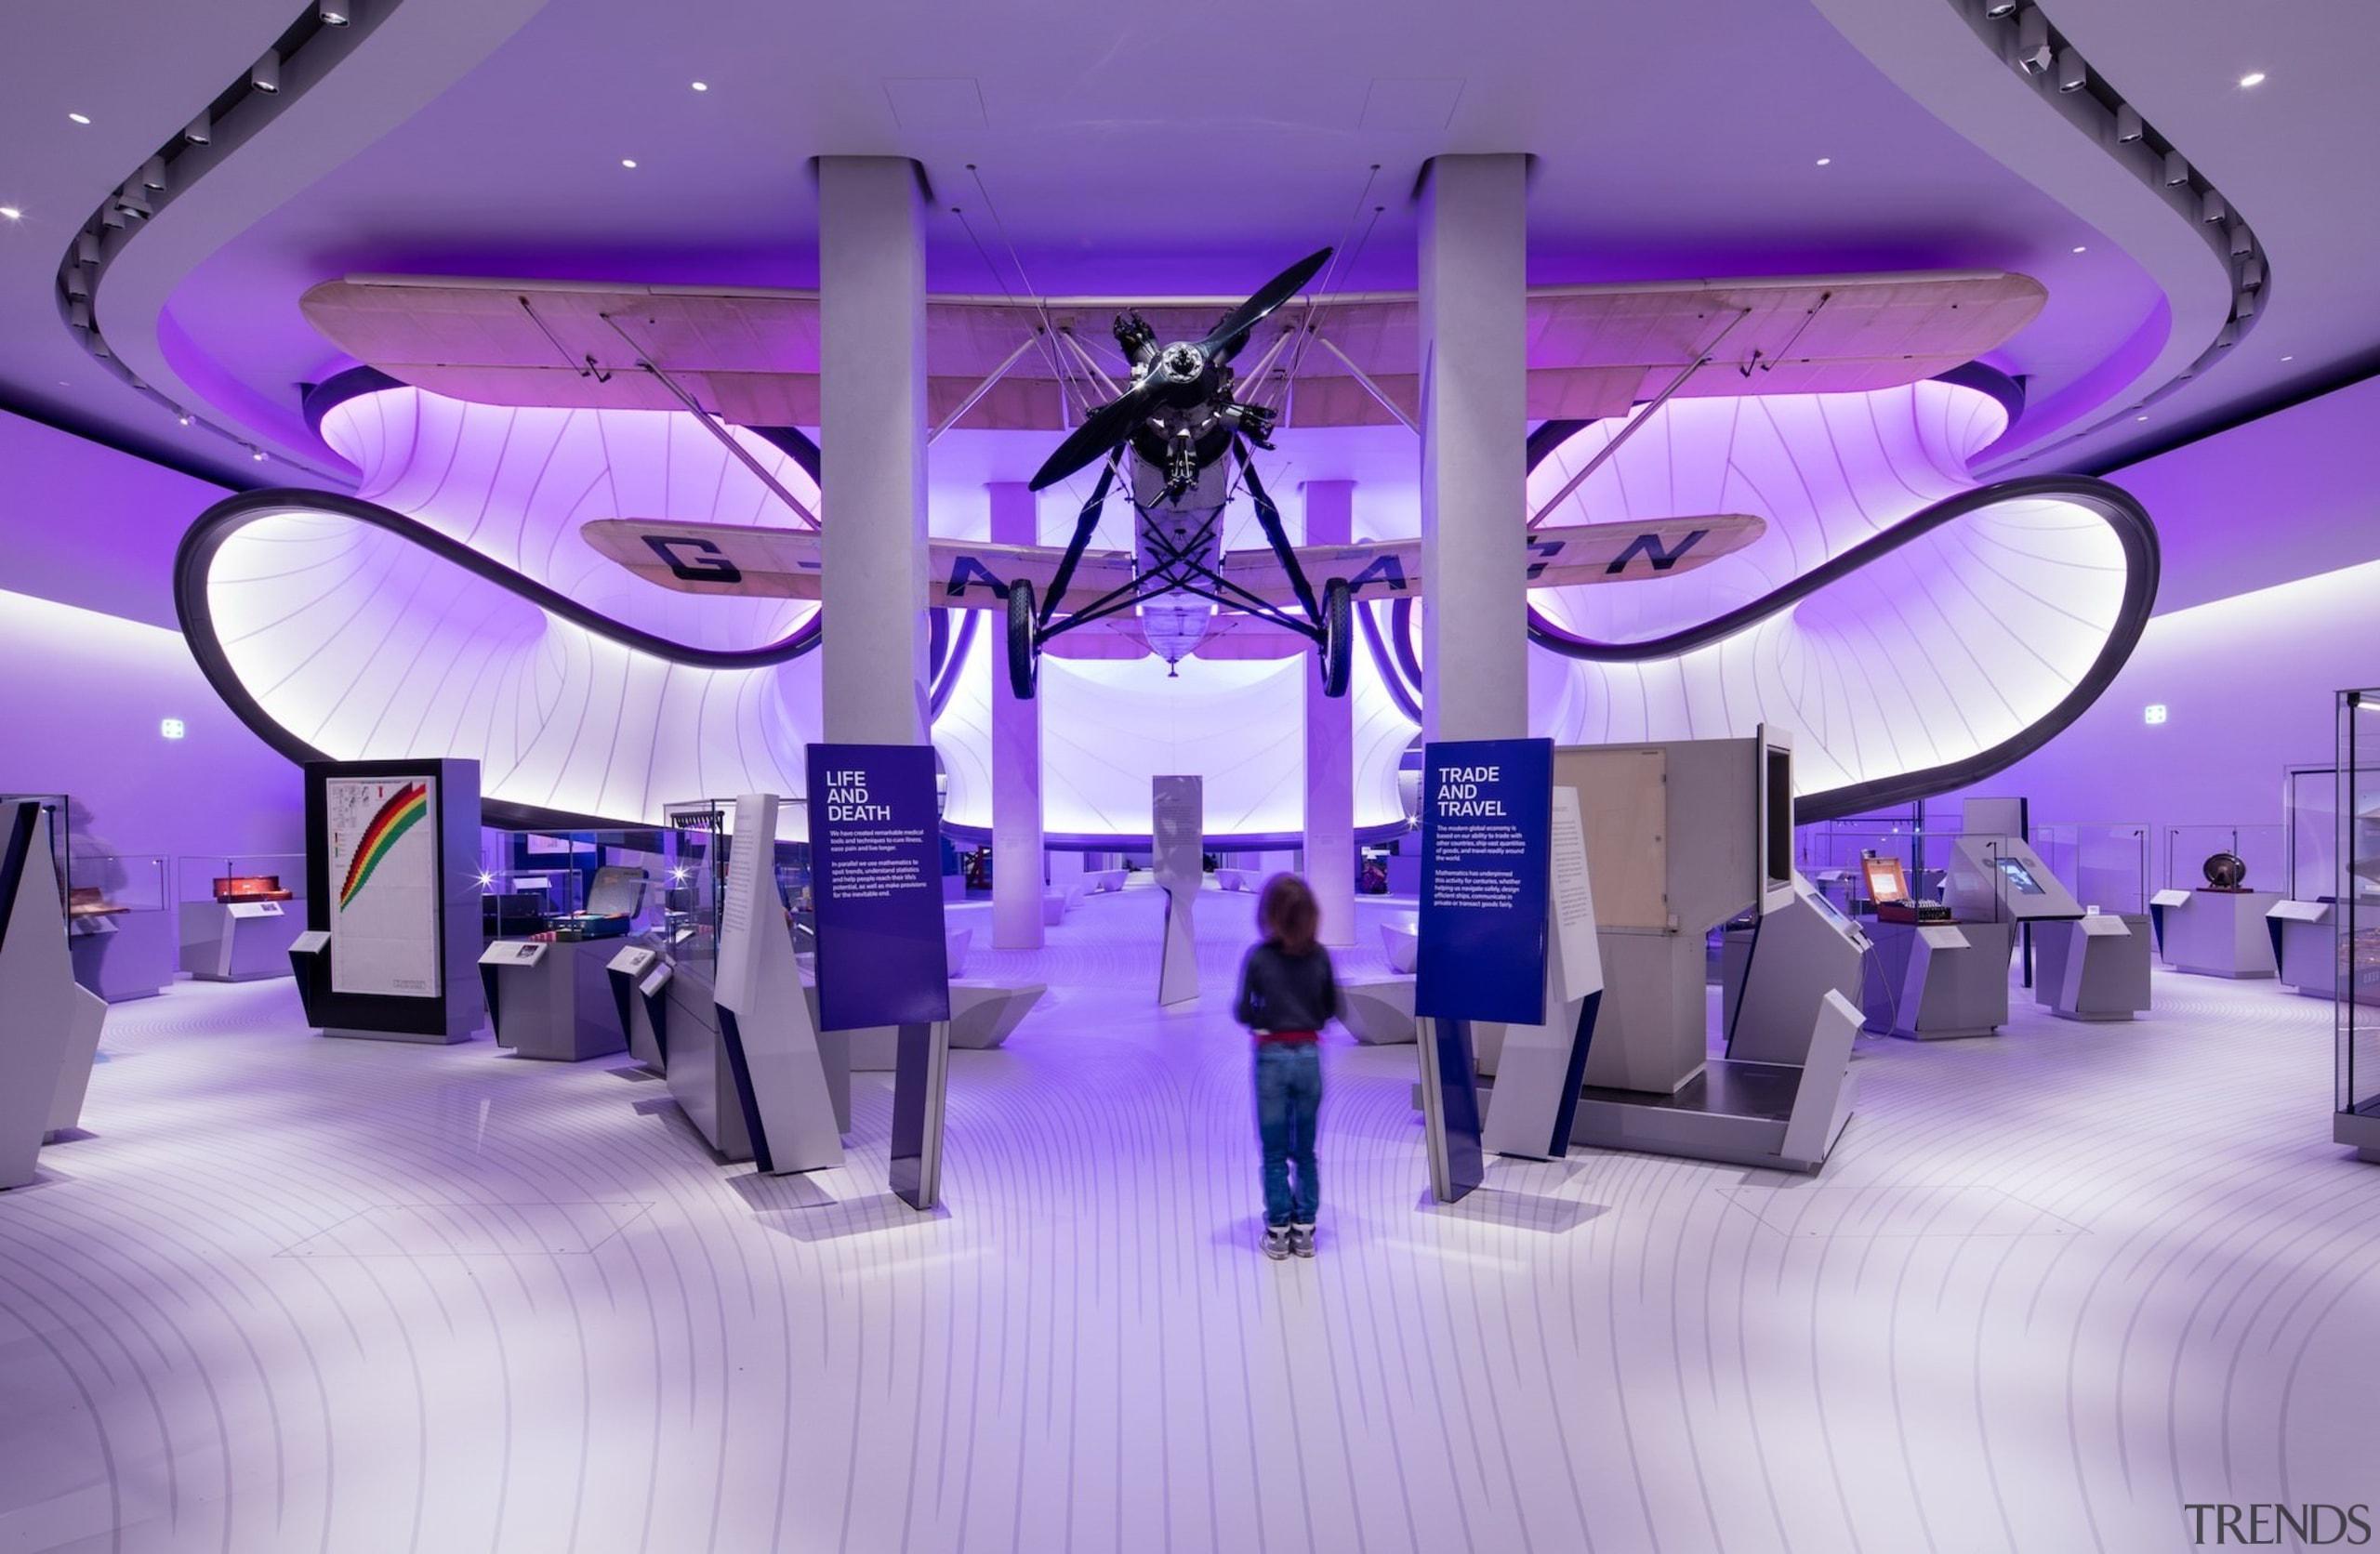 Zaha Hadid – Mathematics: The Winton Gallery – design, function hall, interior design, lighting, purple, structure, purple